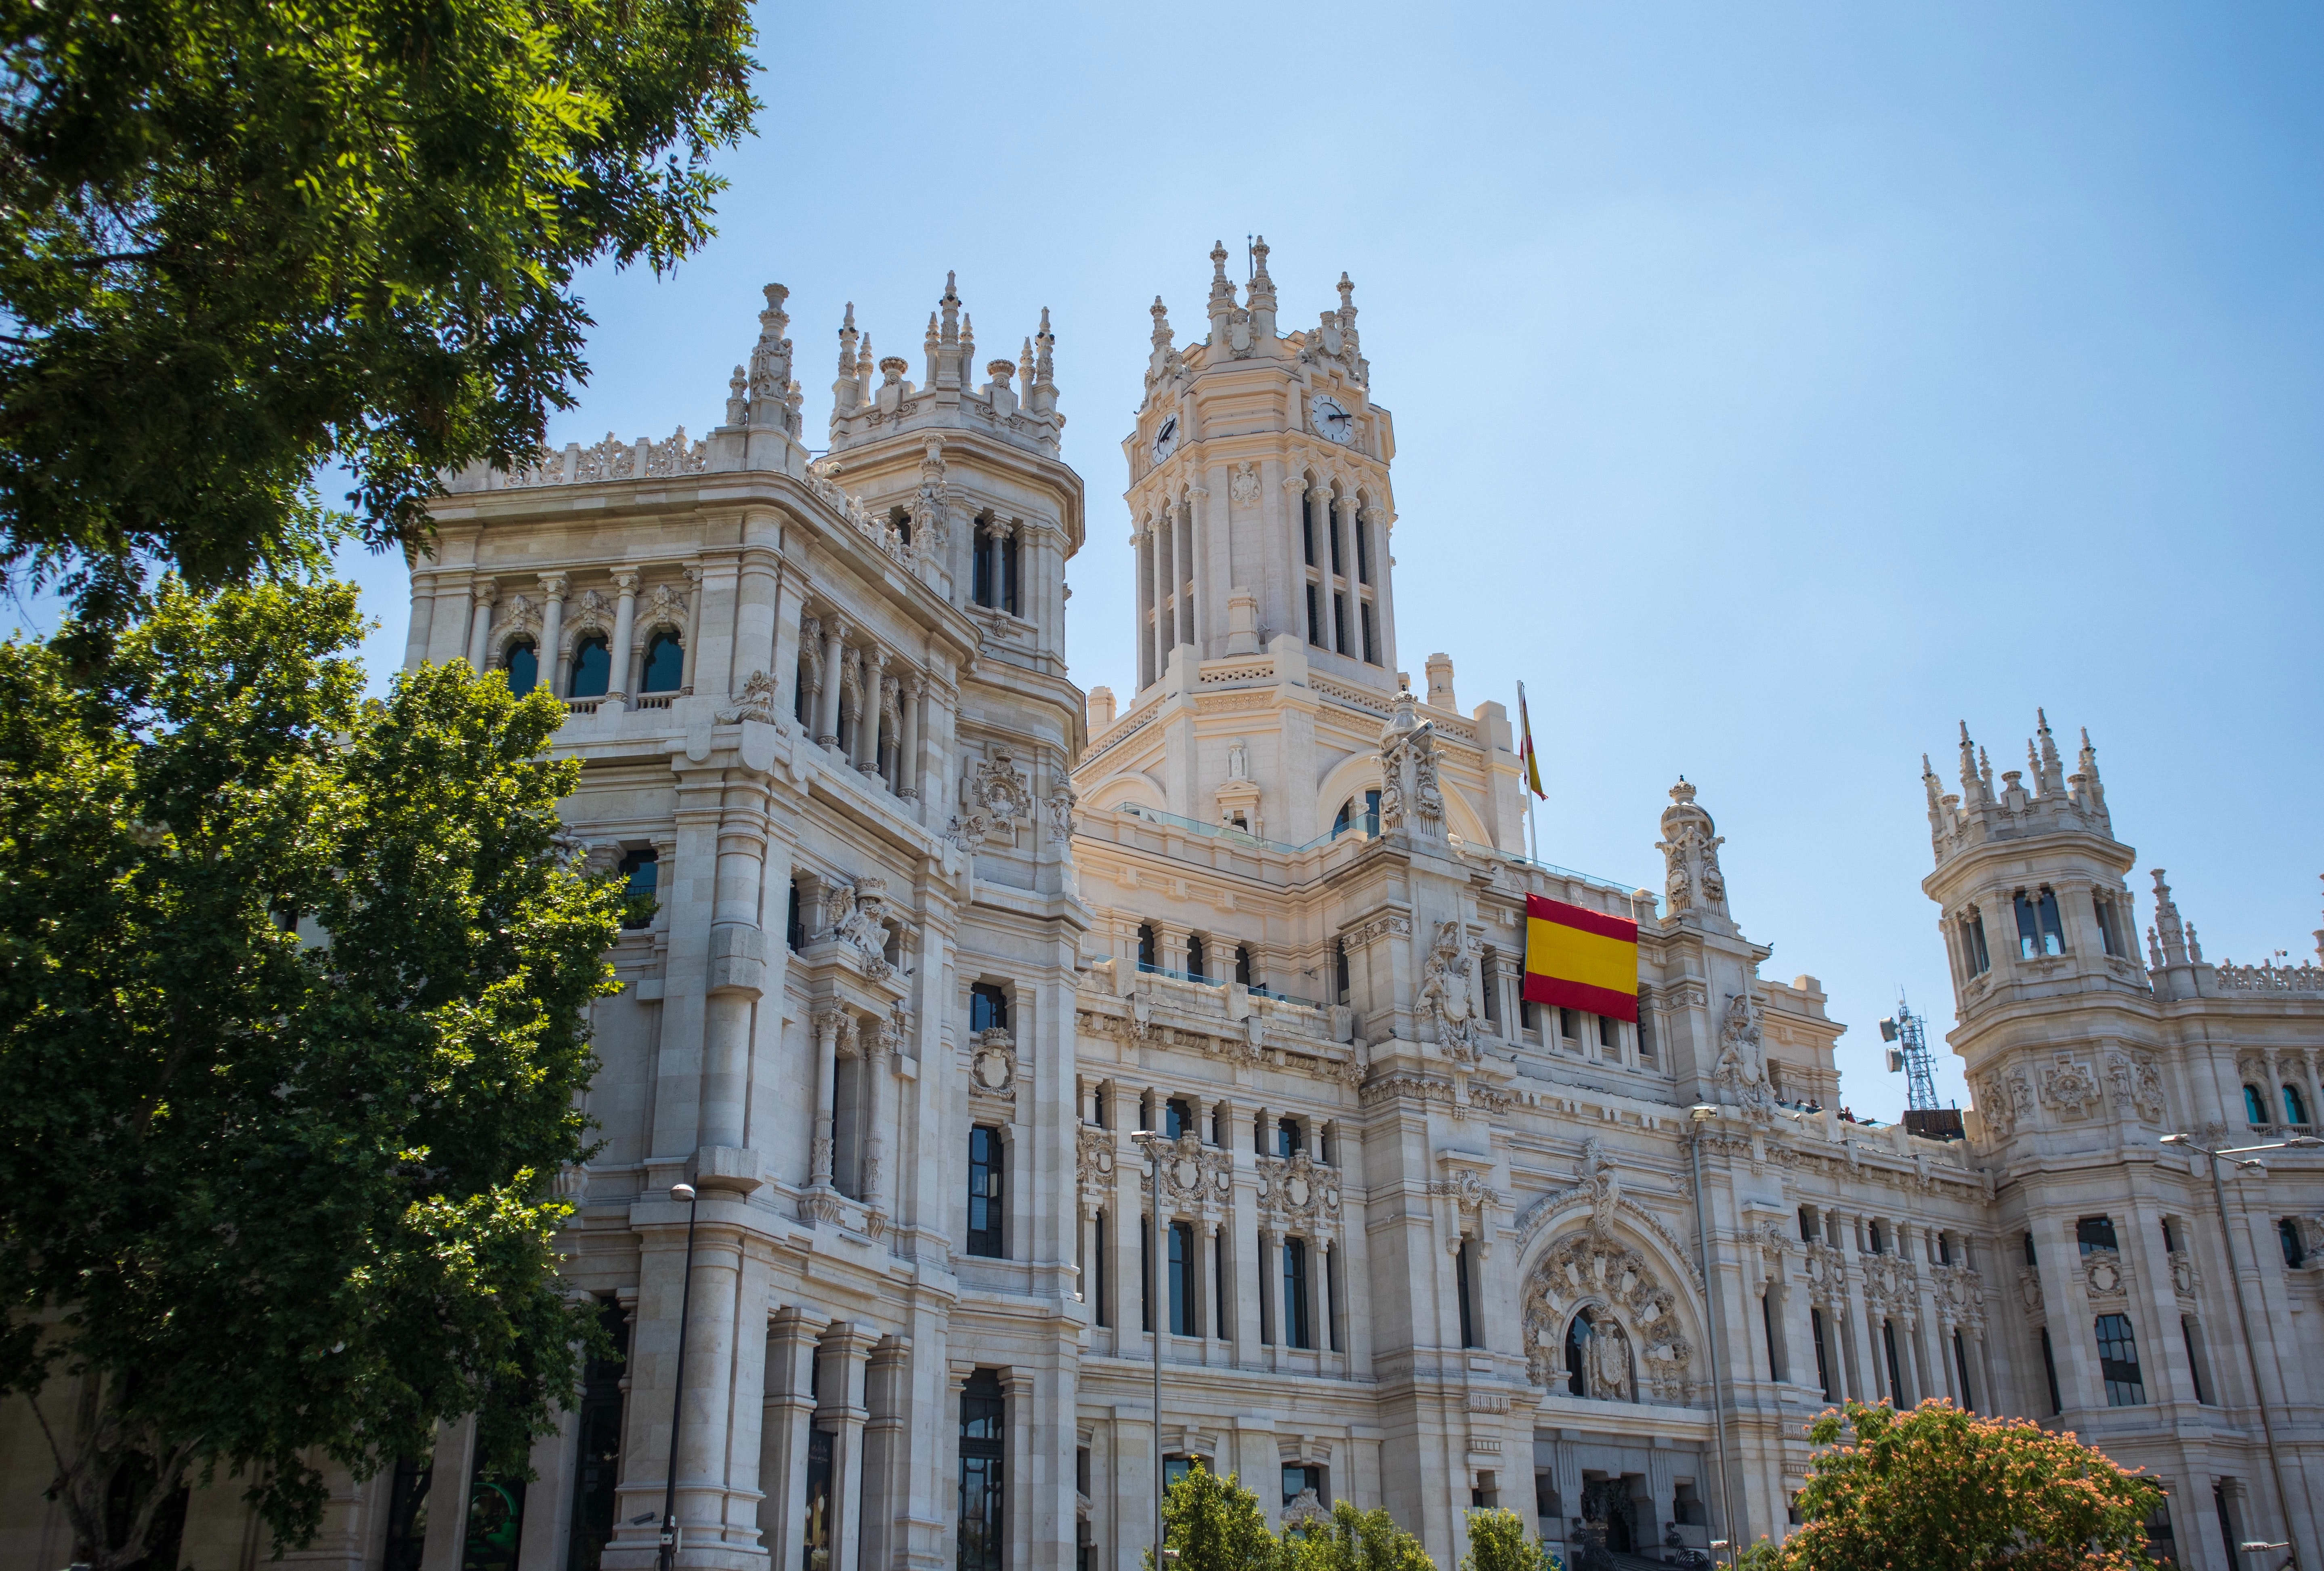 Course Image {mlang en}Easily Exploring SPAIN{mlang} {mlang de}SPANIEN spielend leicht entdecken{mlang}{mlang zh_cn}西班牙之歌{mlang}